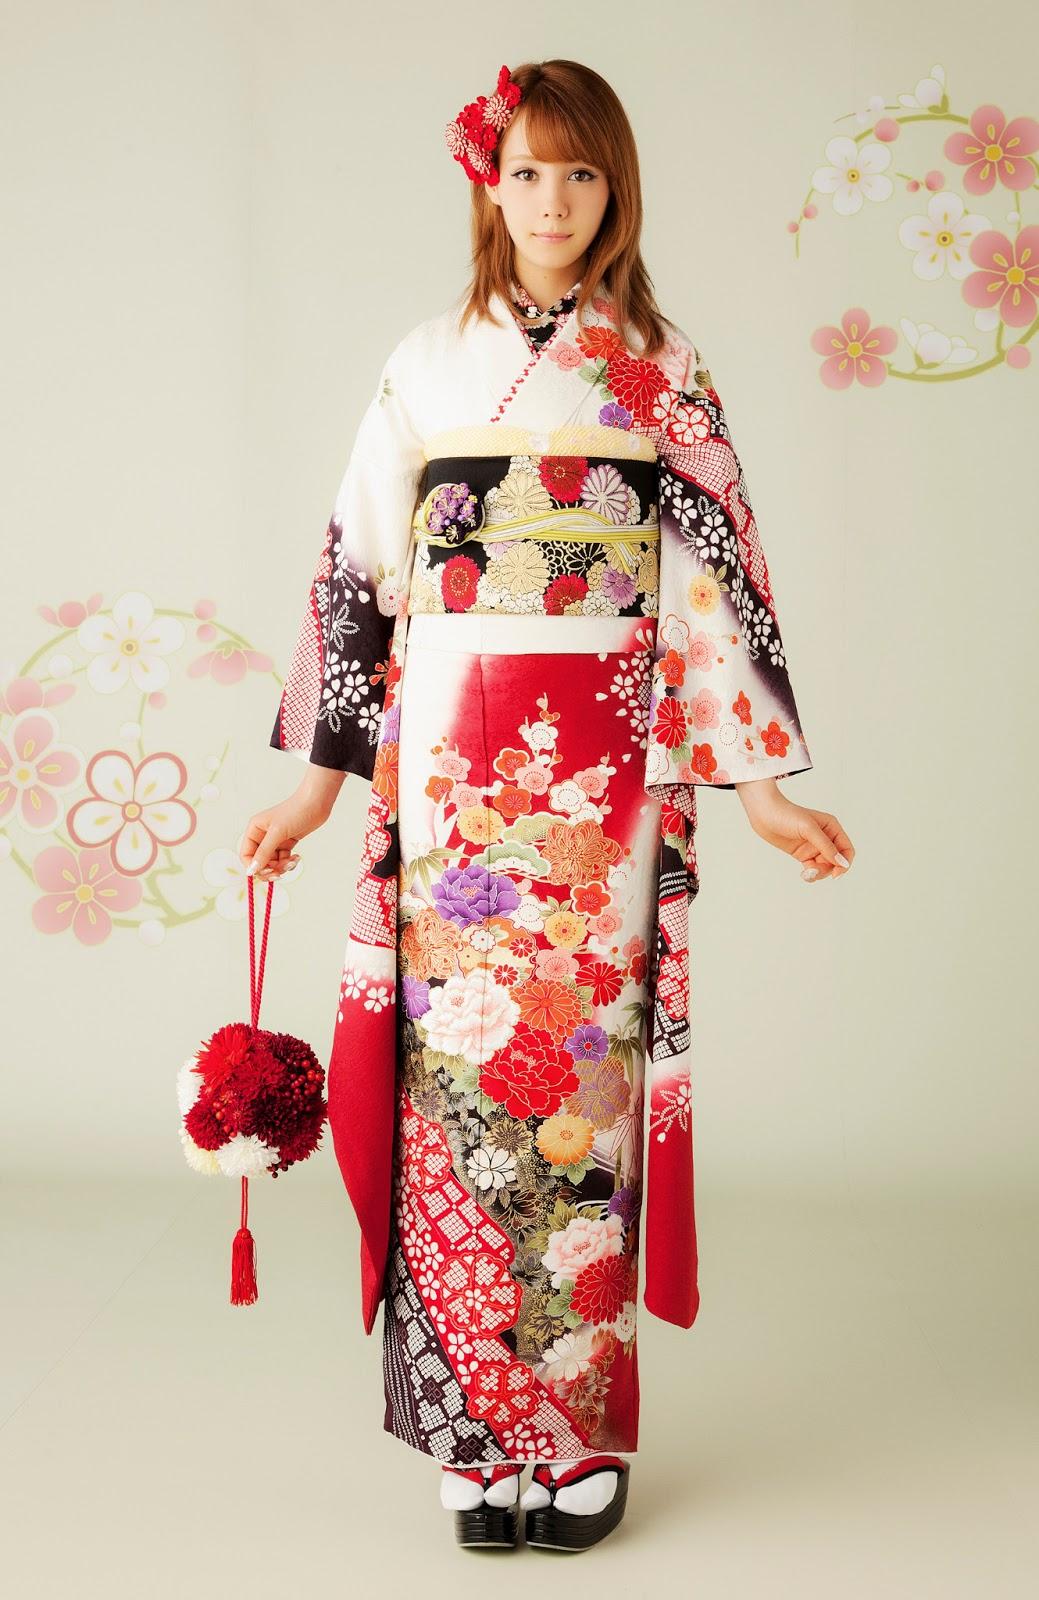 triendleReina_PrincessKyoto_PK-3102_2.jpg